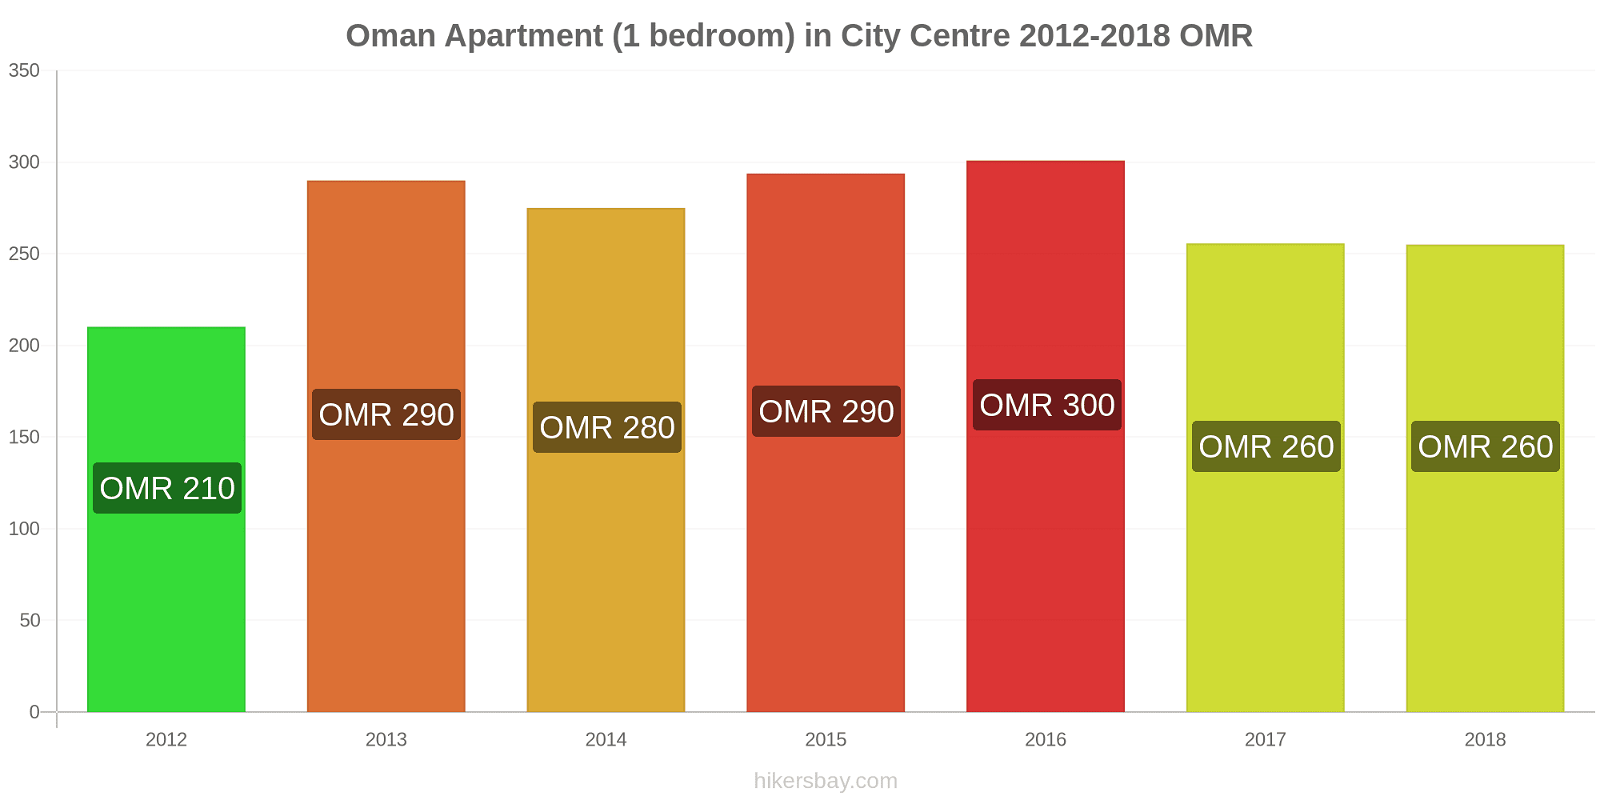 Oman price changes Apartment (1 bedroom) in City Centre hikersbay.com